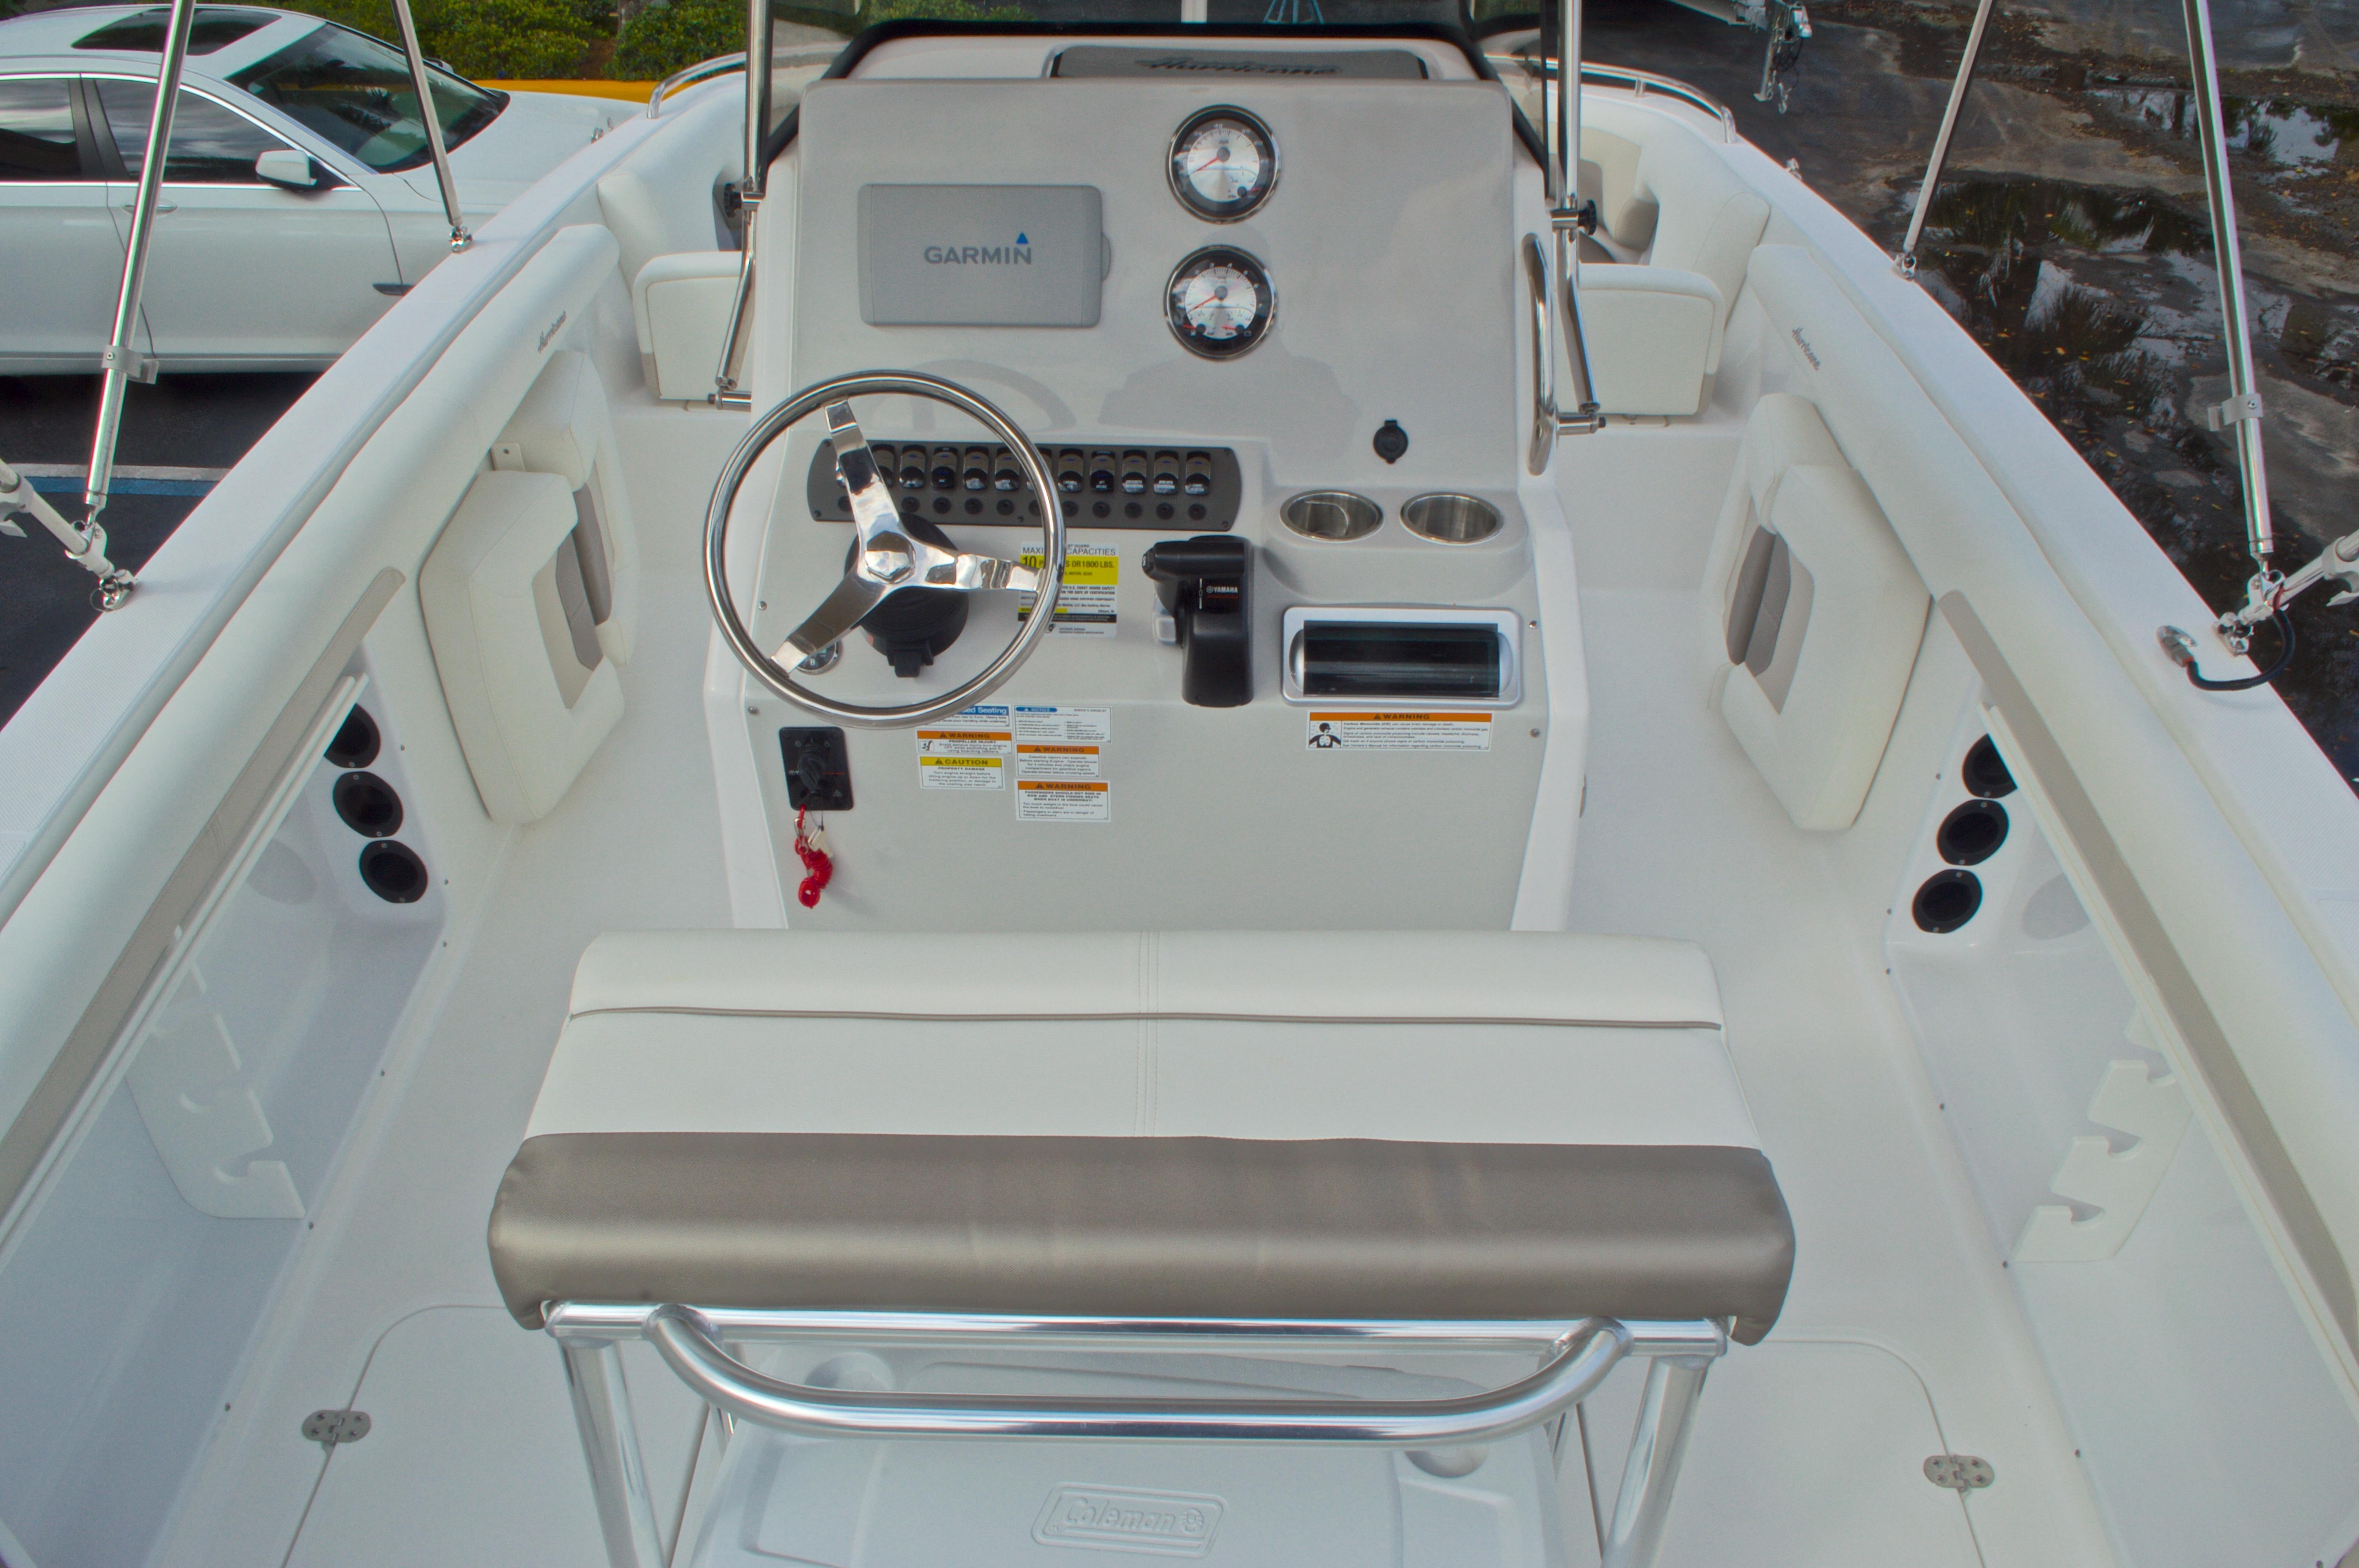 Thumbnail 10 for New 2016 Hurricane CC21 Center Console boat for sale in Vero Beach, FL